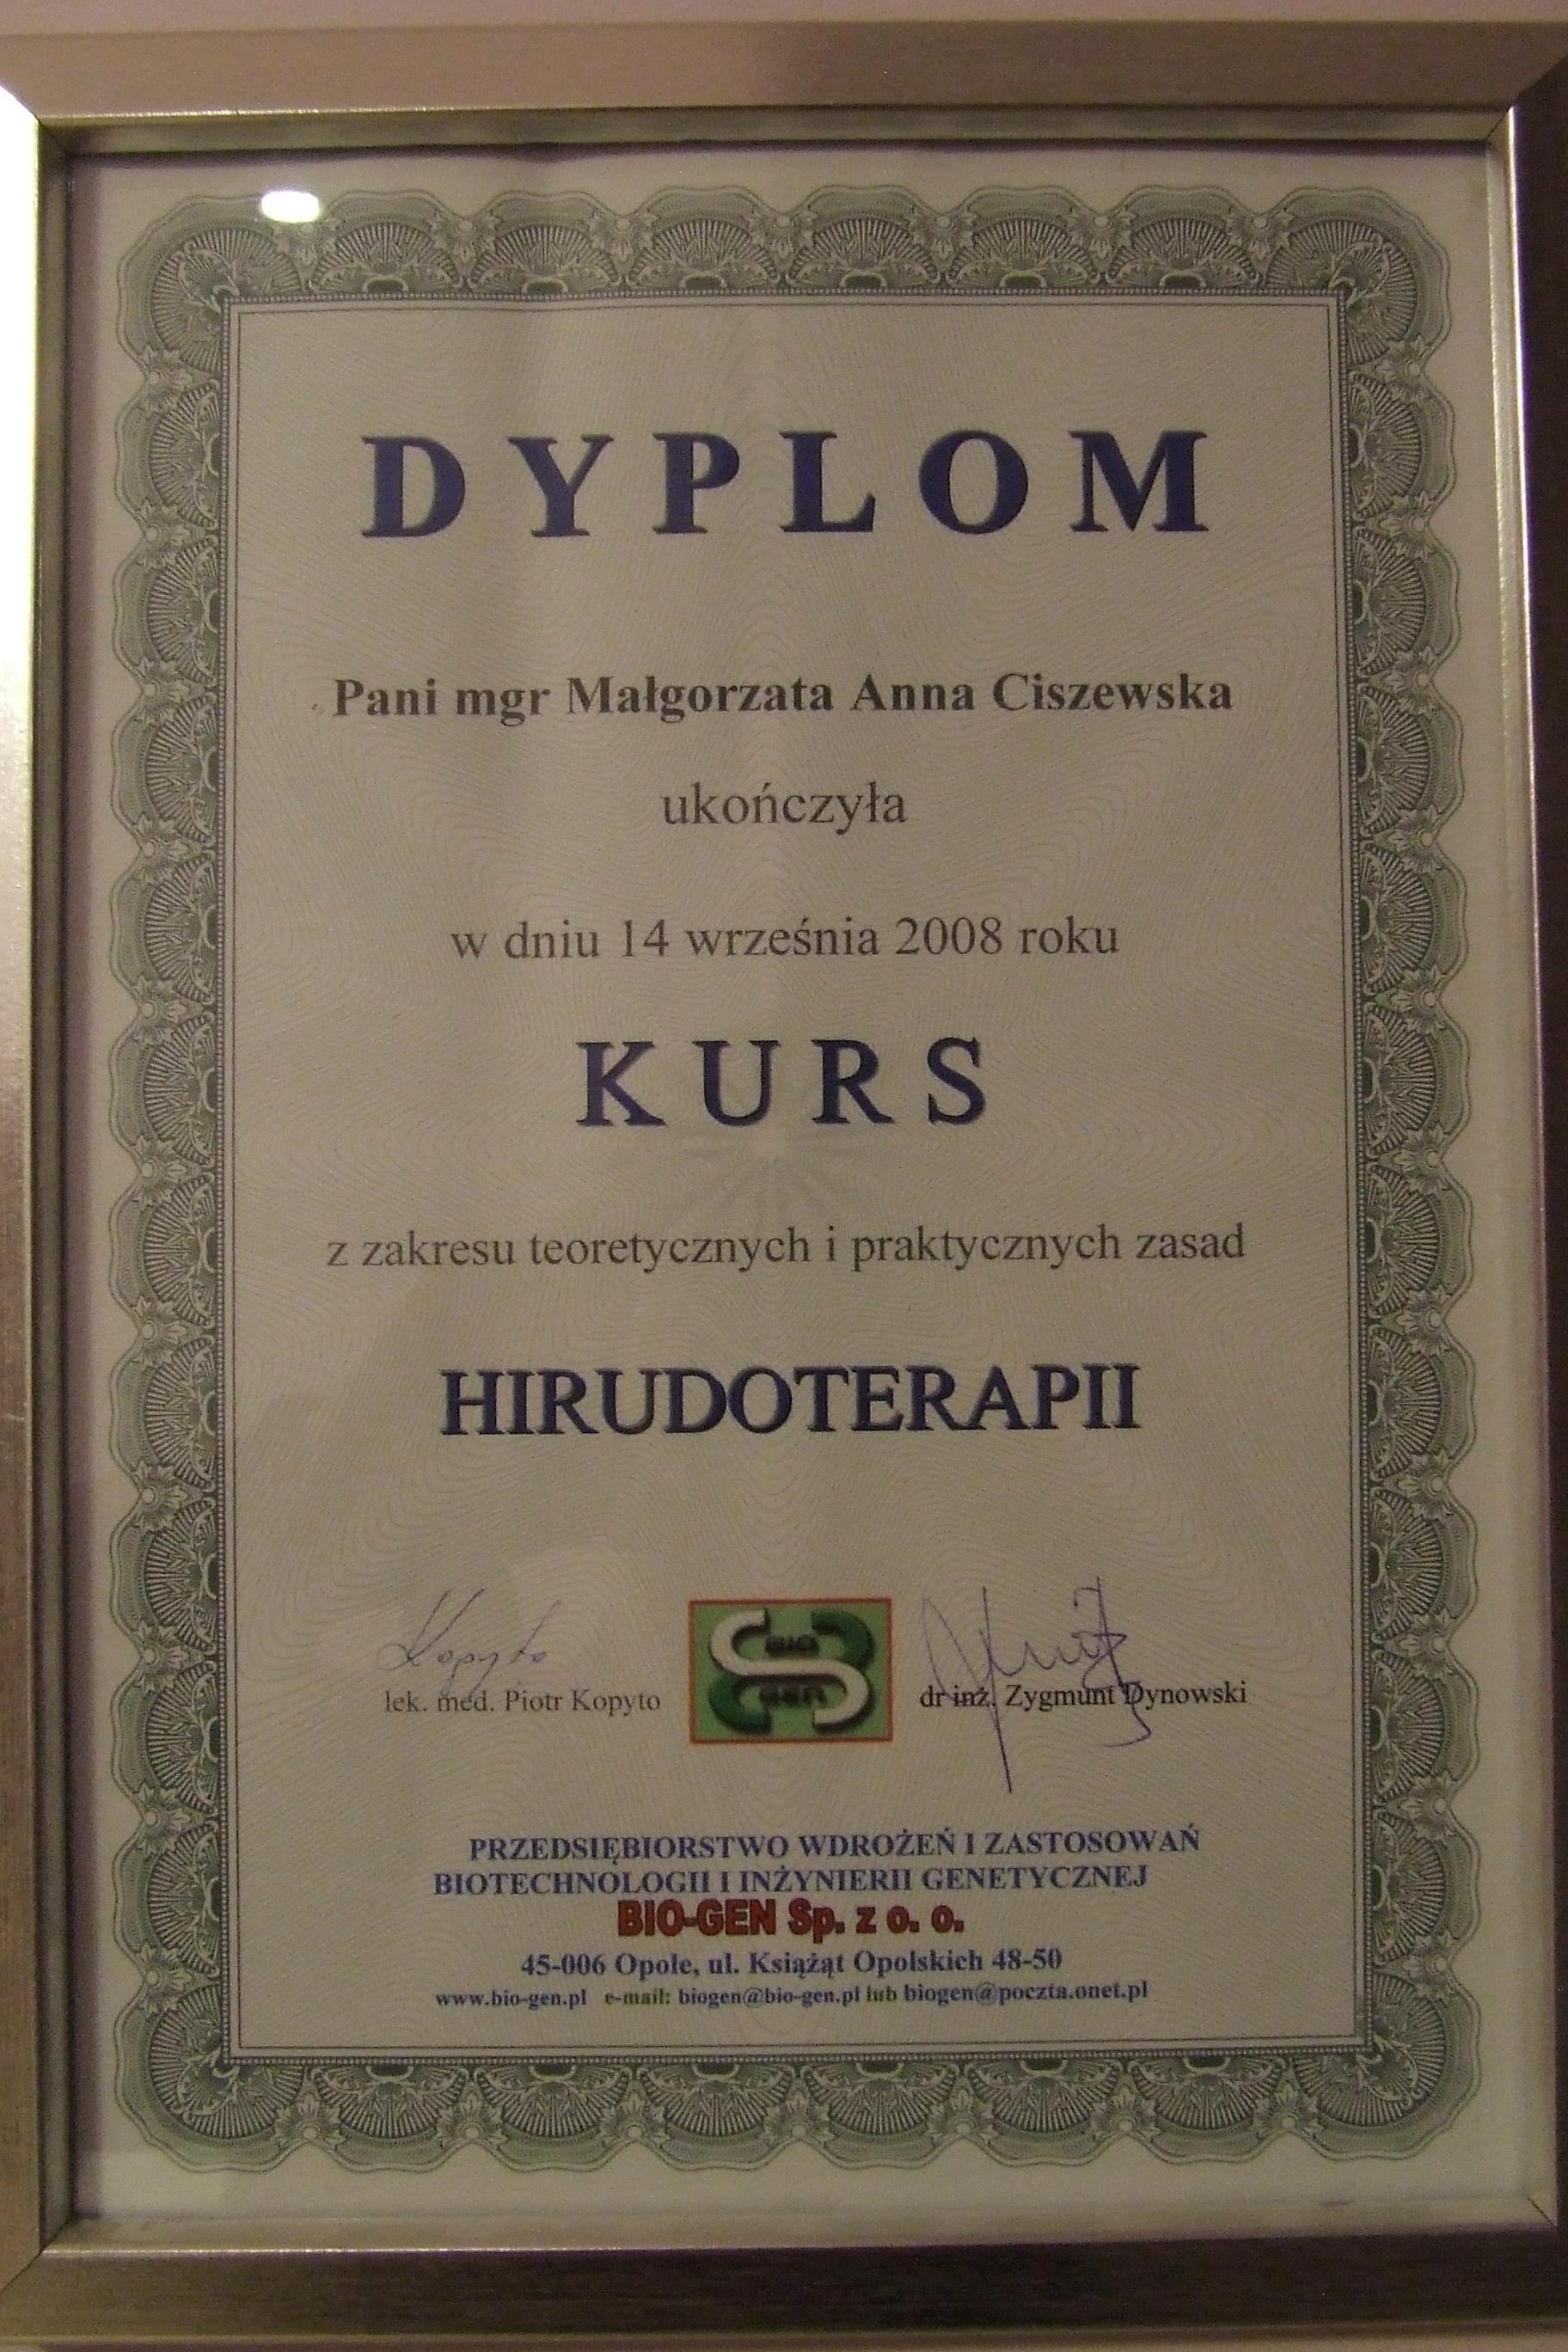 dyplom ukończenia kursu hirudoterapii